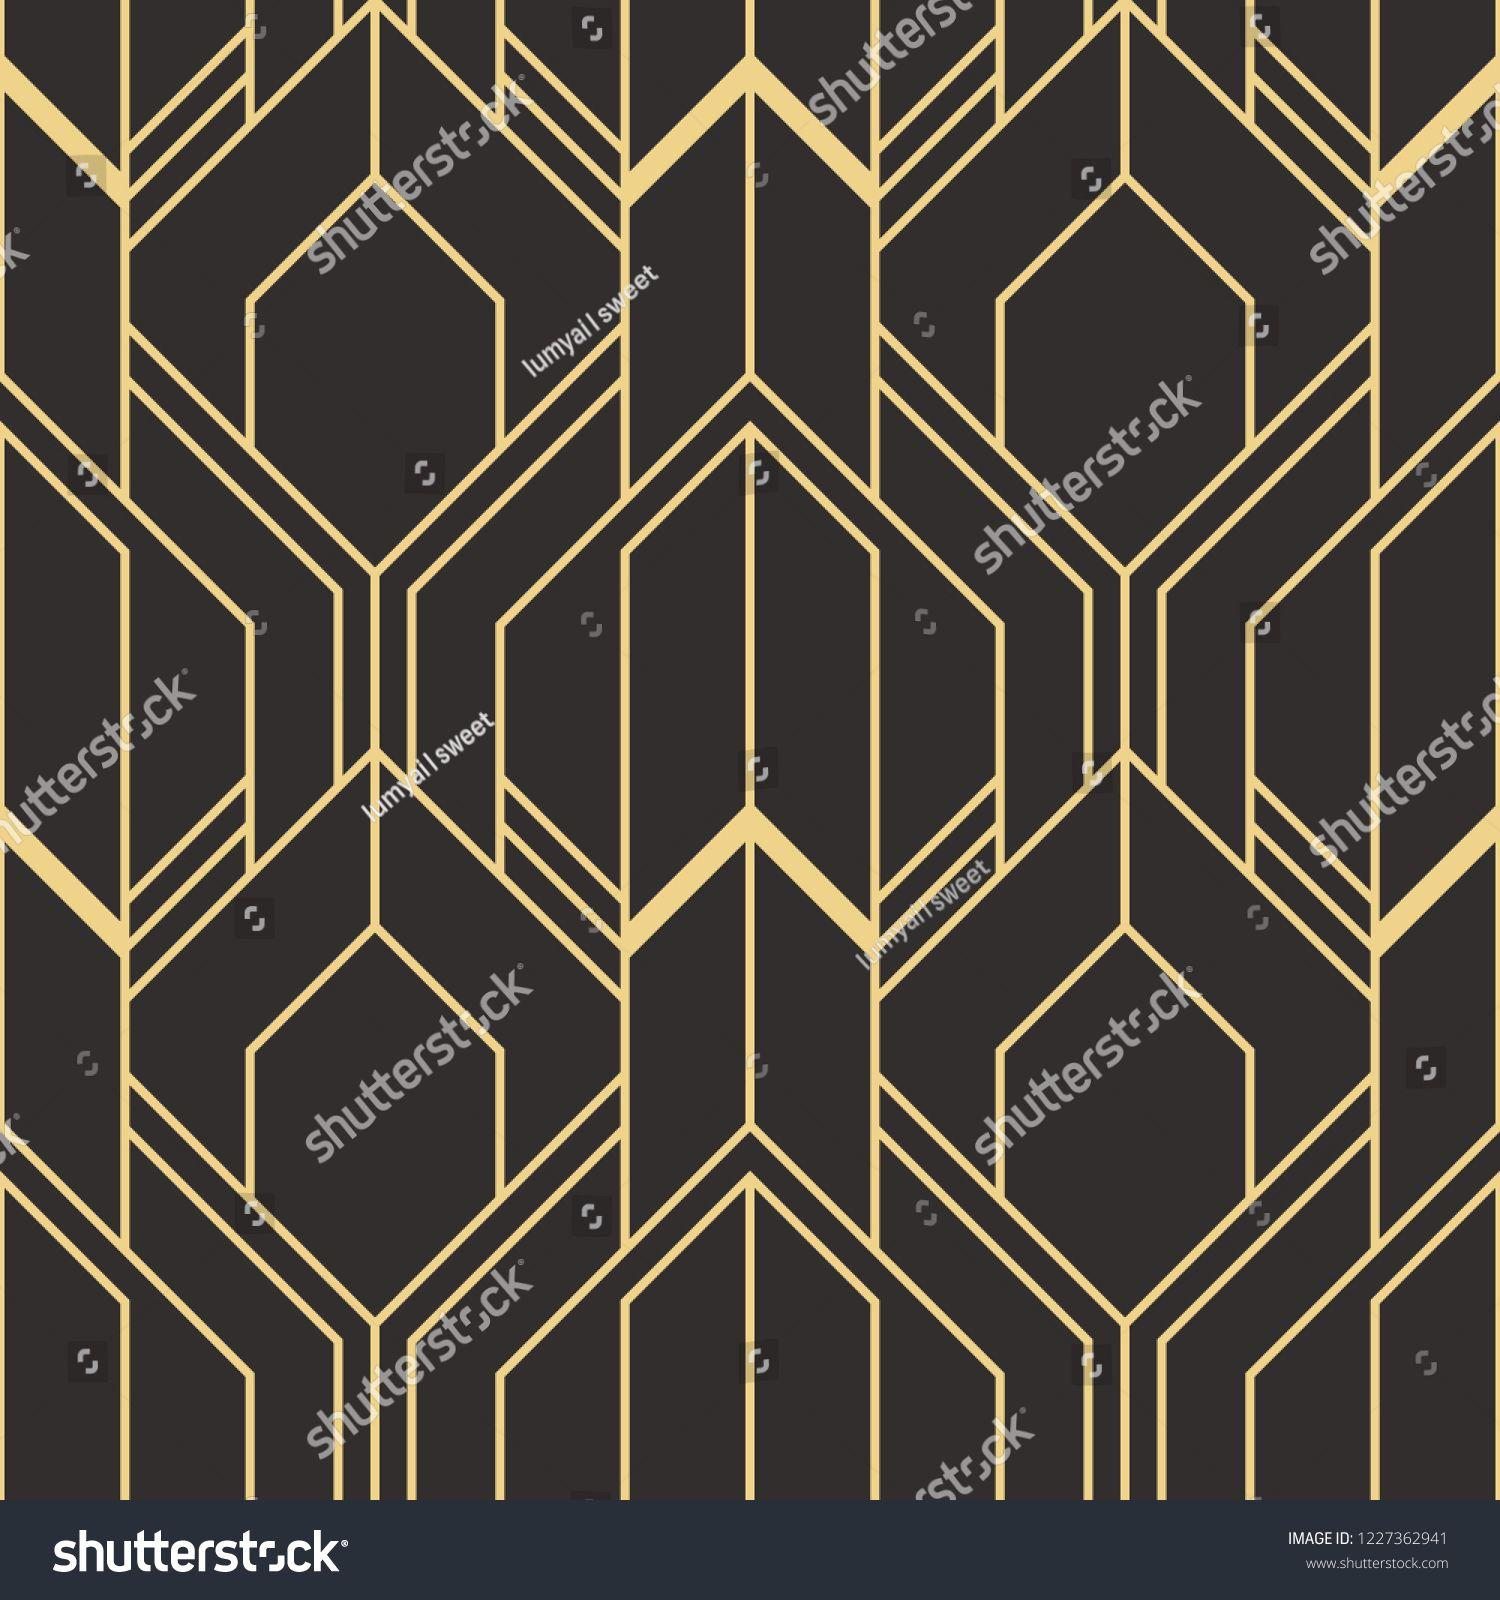 vector modern geometric tiles pattern